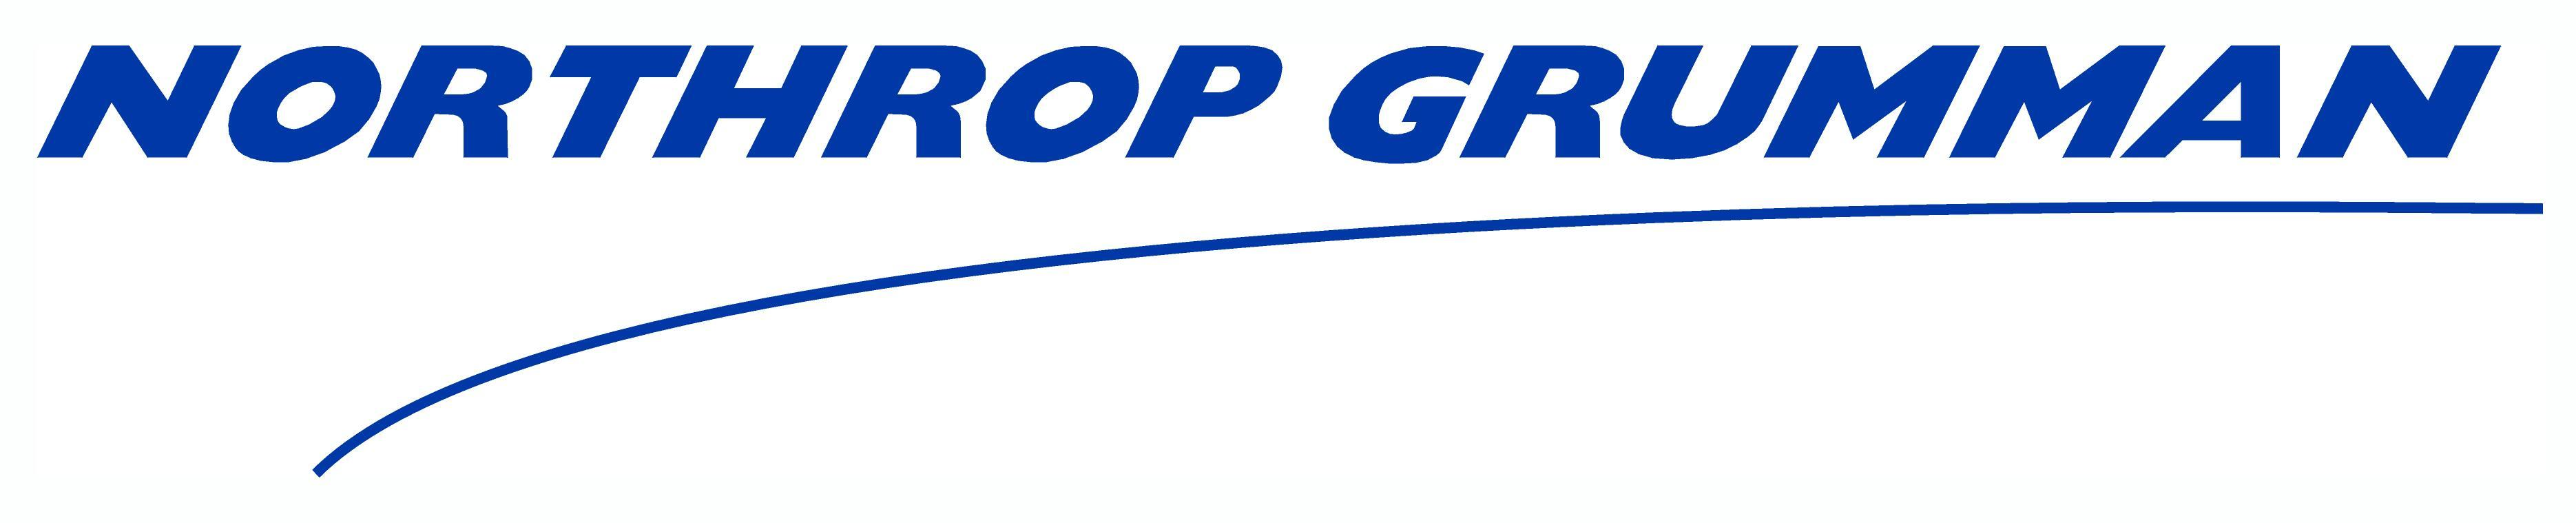 Assessing Defense: Northrop Grumman